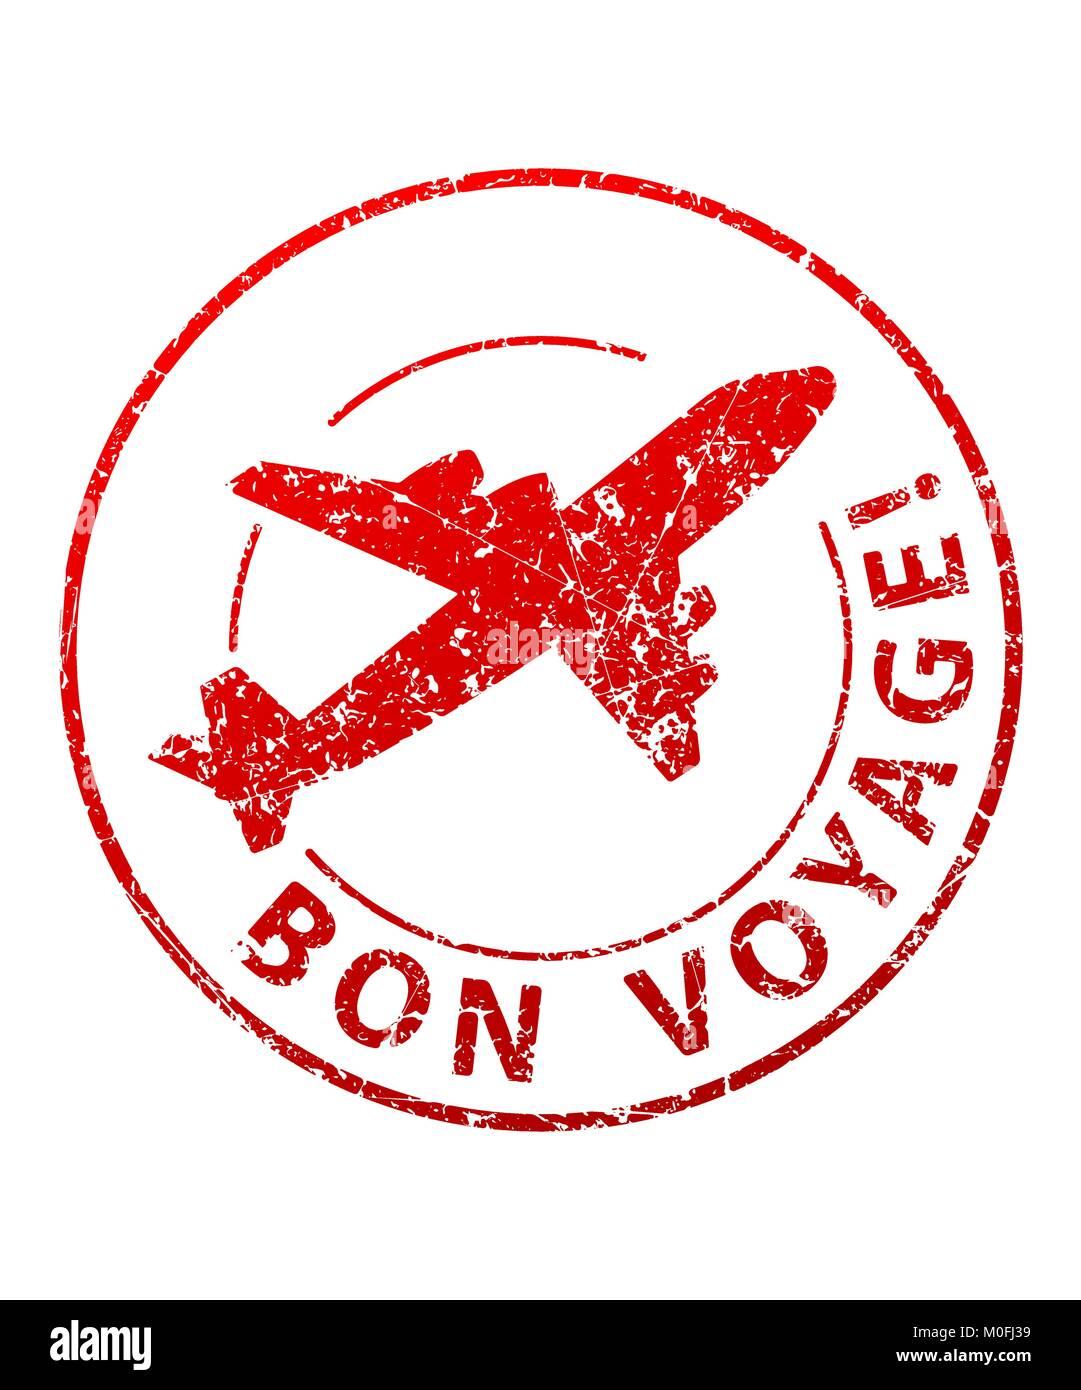 Bon voyage rubber stamp Stock Vector Image & Art - Alamy